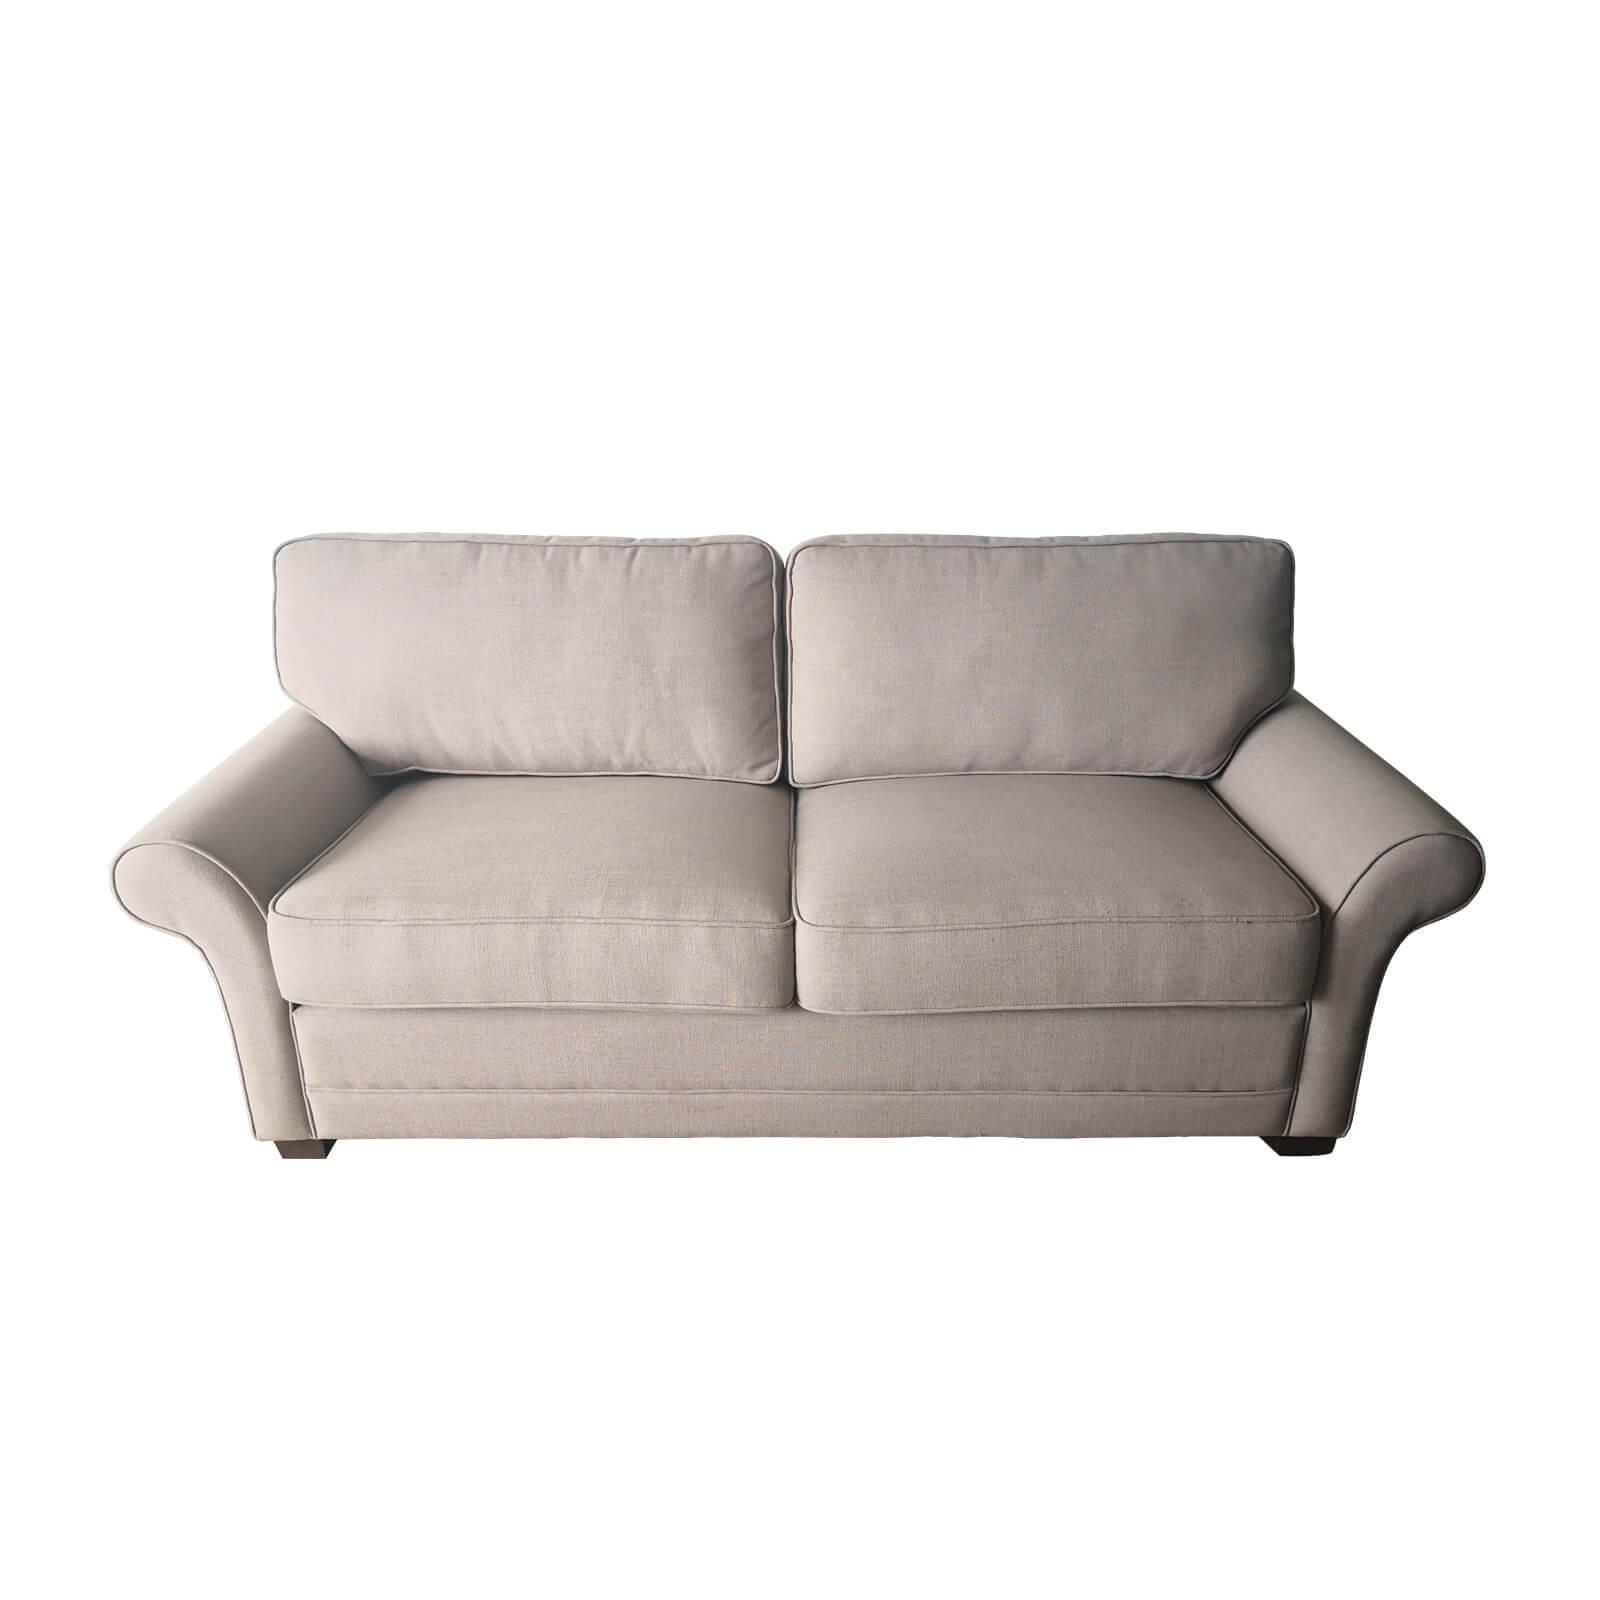 Moran Baxter Sofa Bed   Two Design Lovers